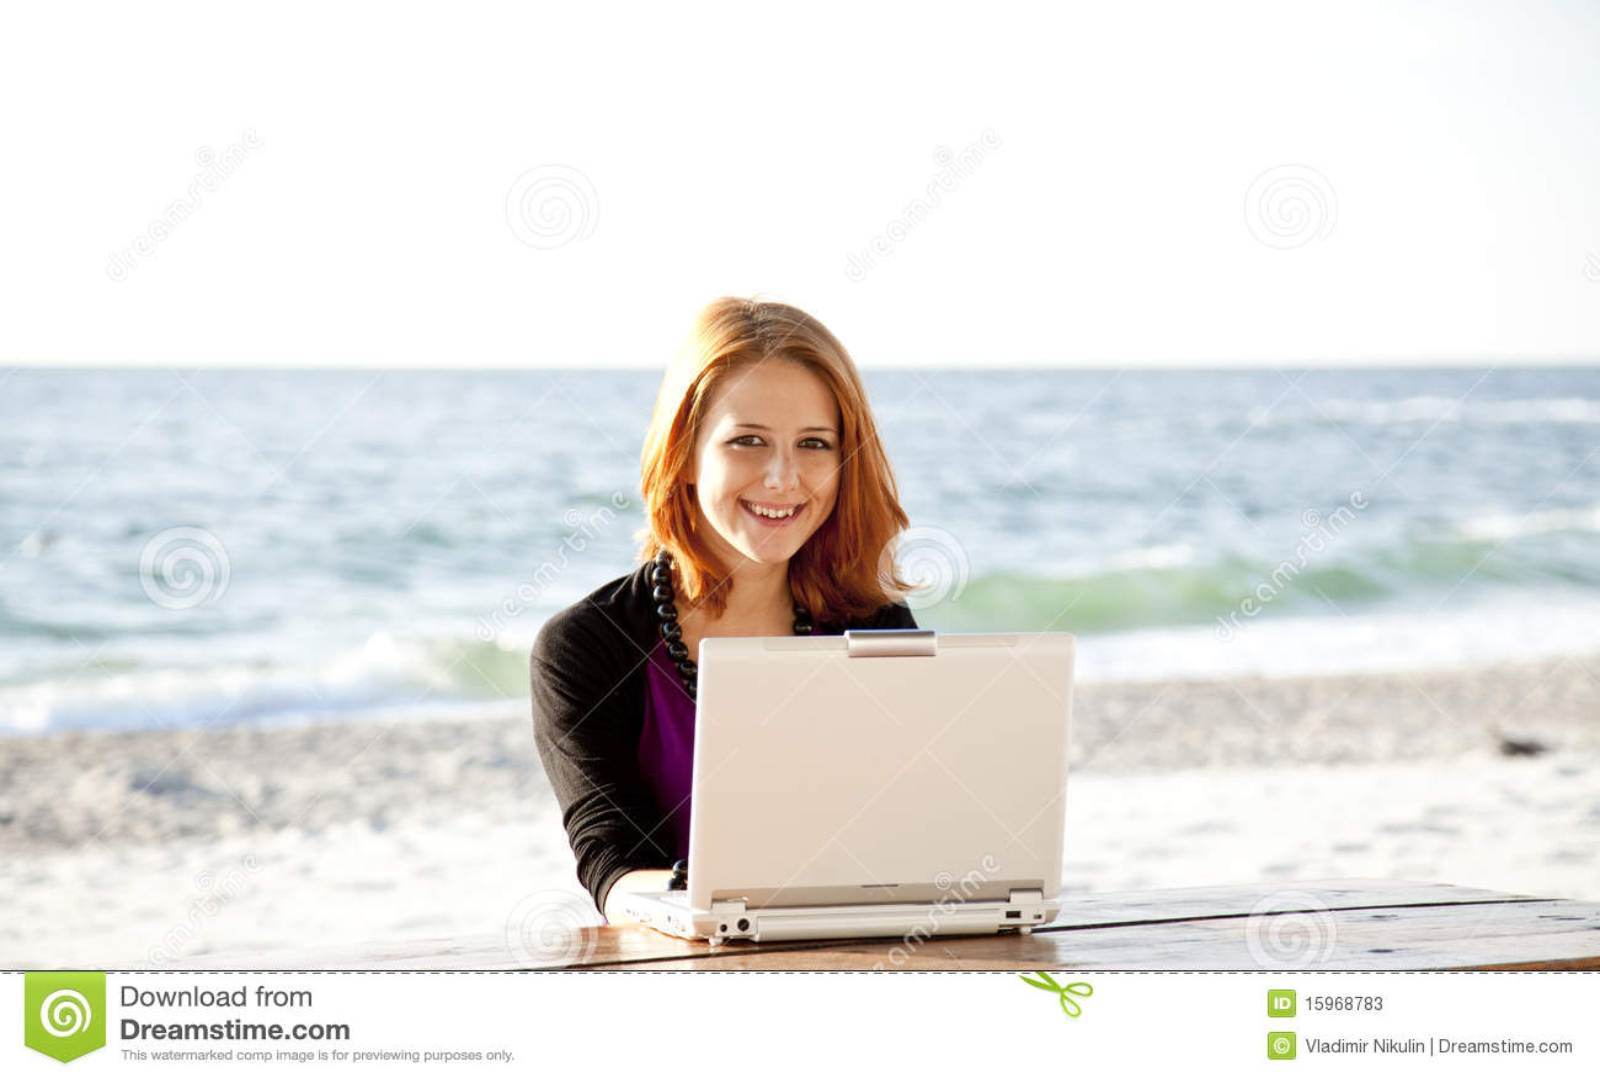 Портрет red-haired девушки с компьтер-книжкой на пляже.